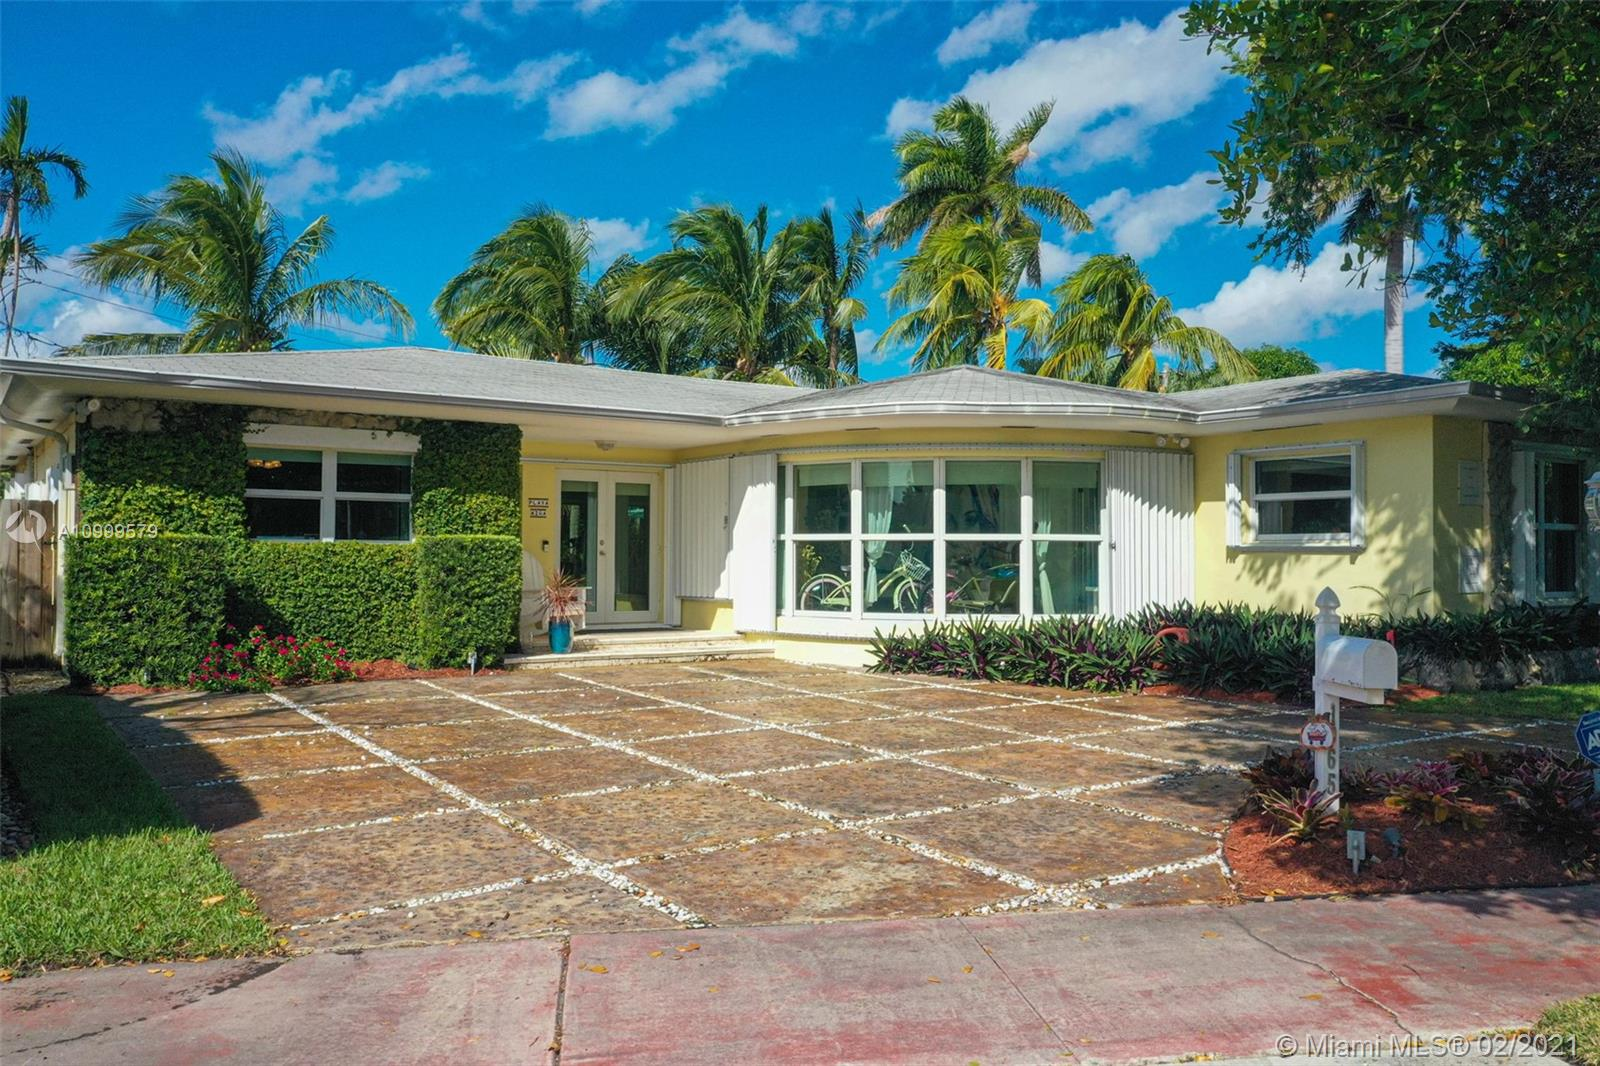 Isle of Normandy - 1065 Fairway Dr, Miami Beach, FL 33141